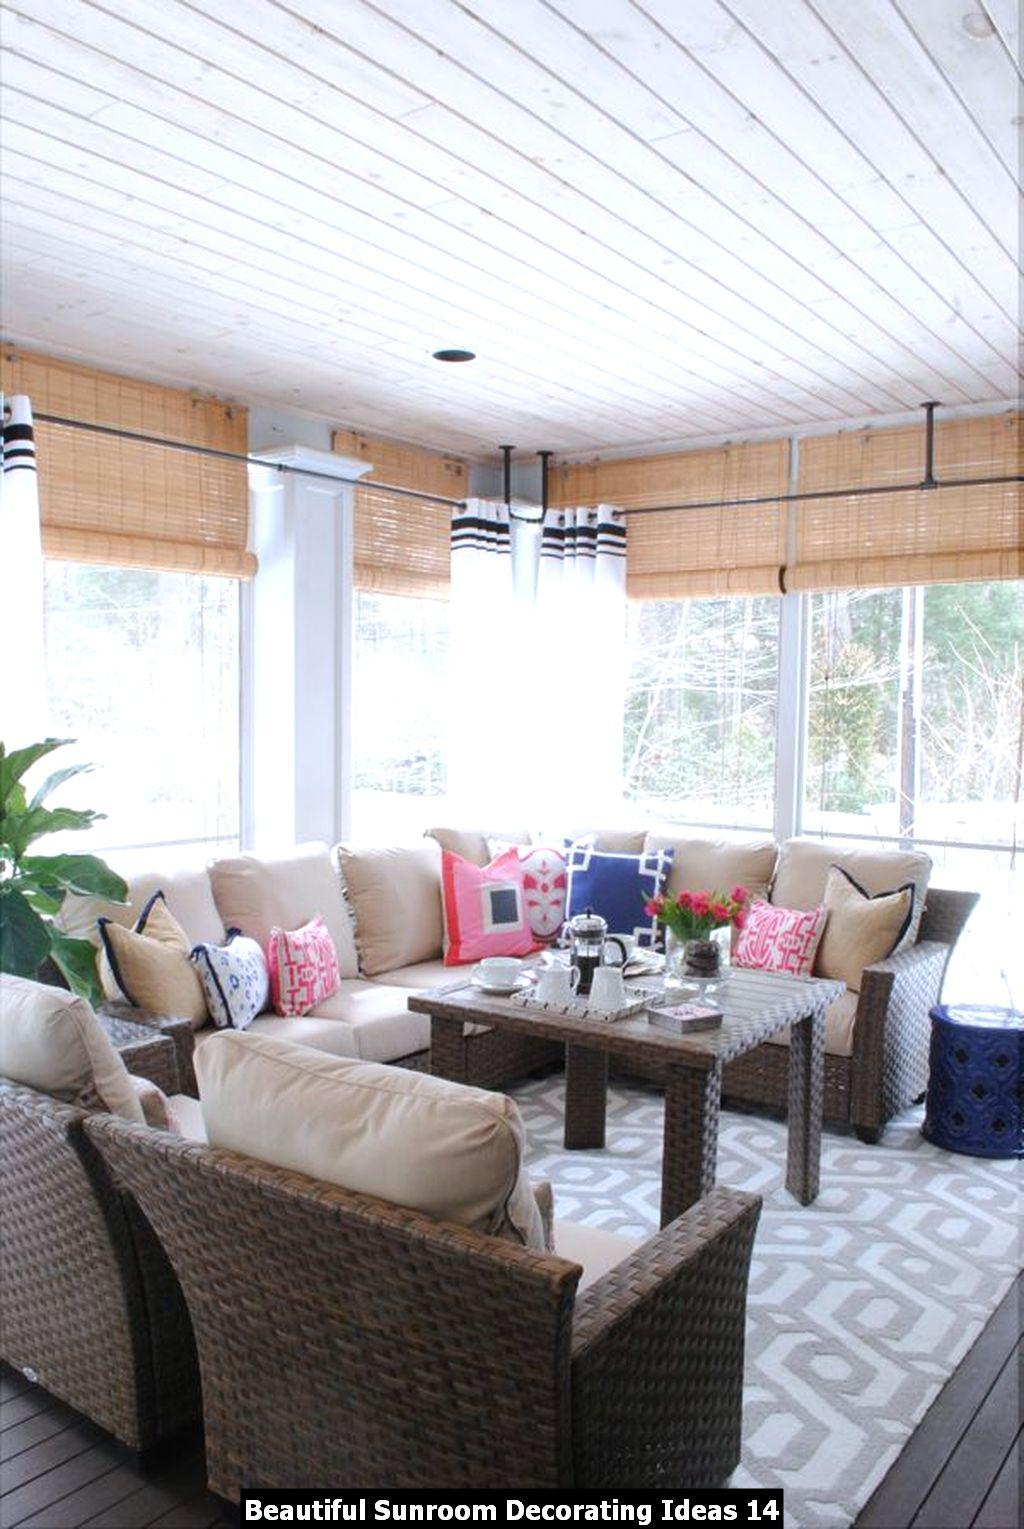 Beautiful Sunroom Decorating Ideas 14